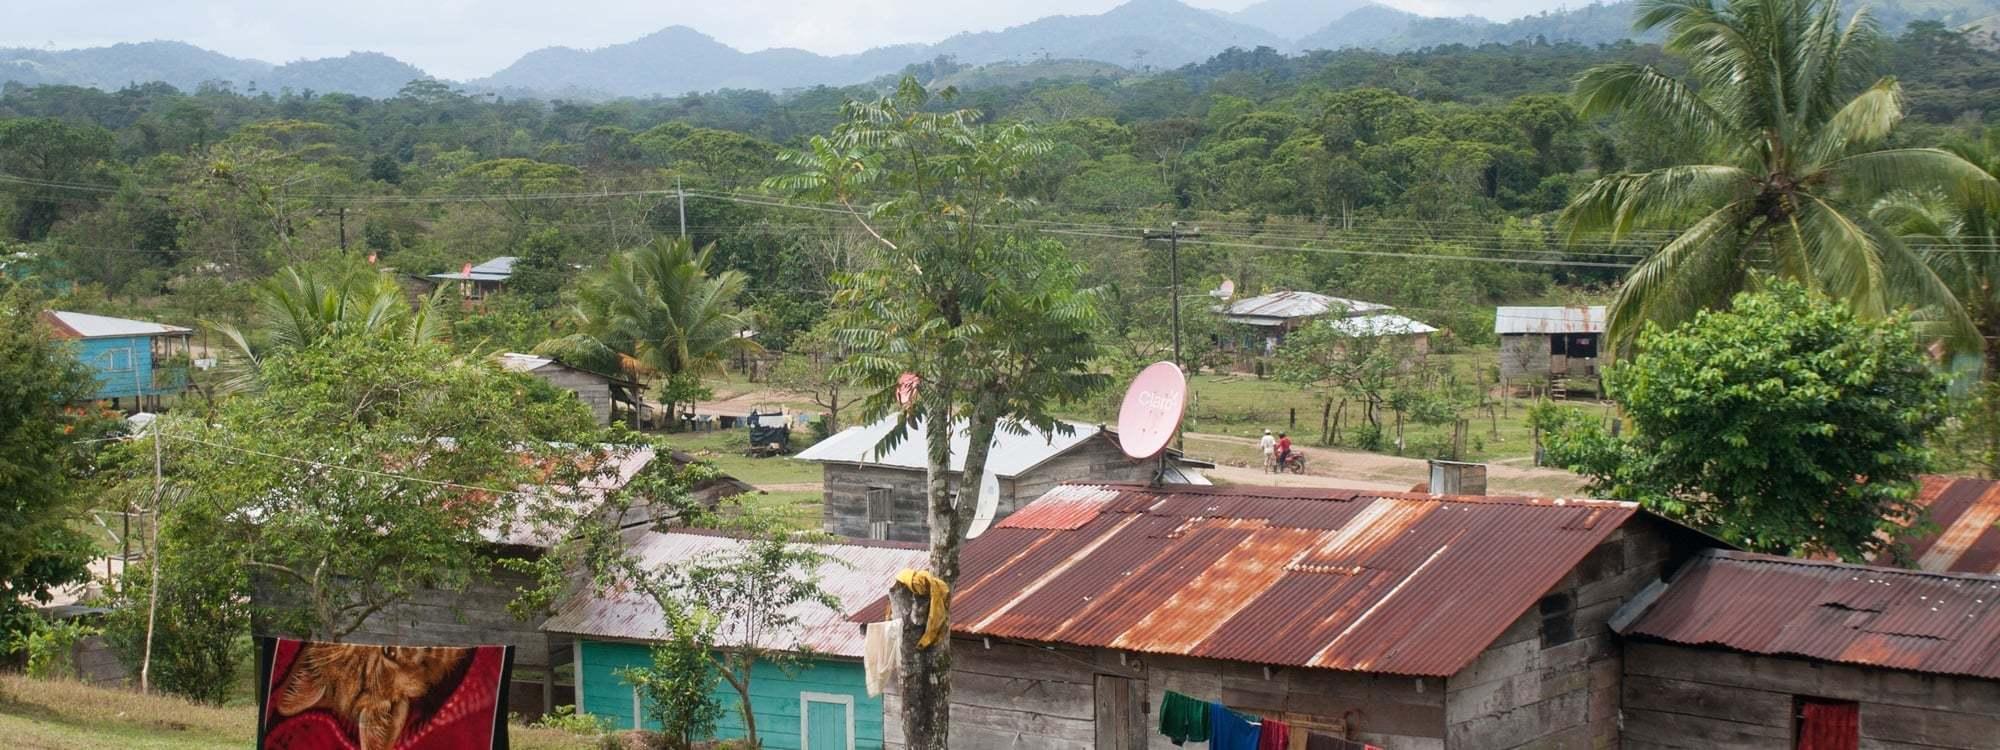 Utsikt över en liten by i Nicaragua